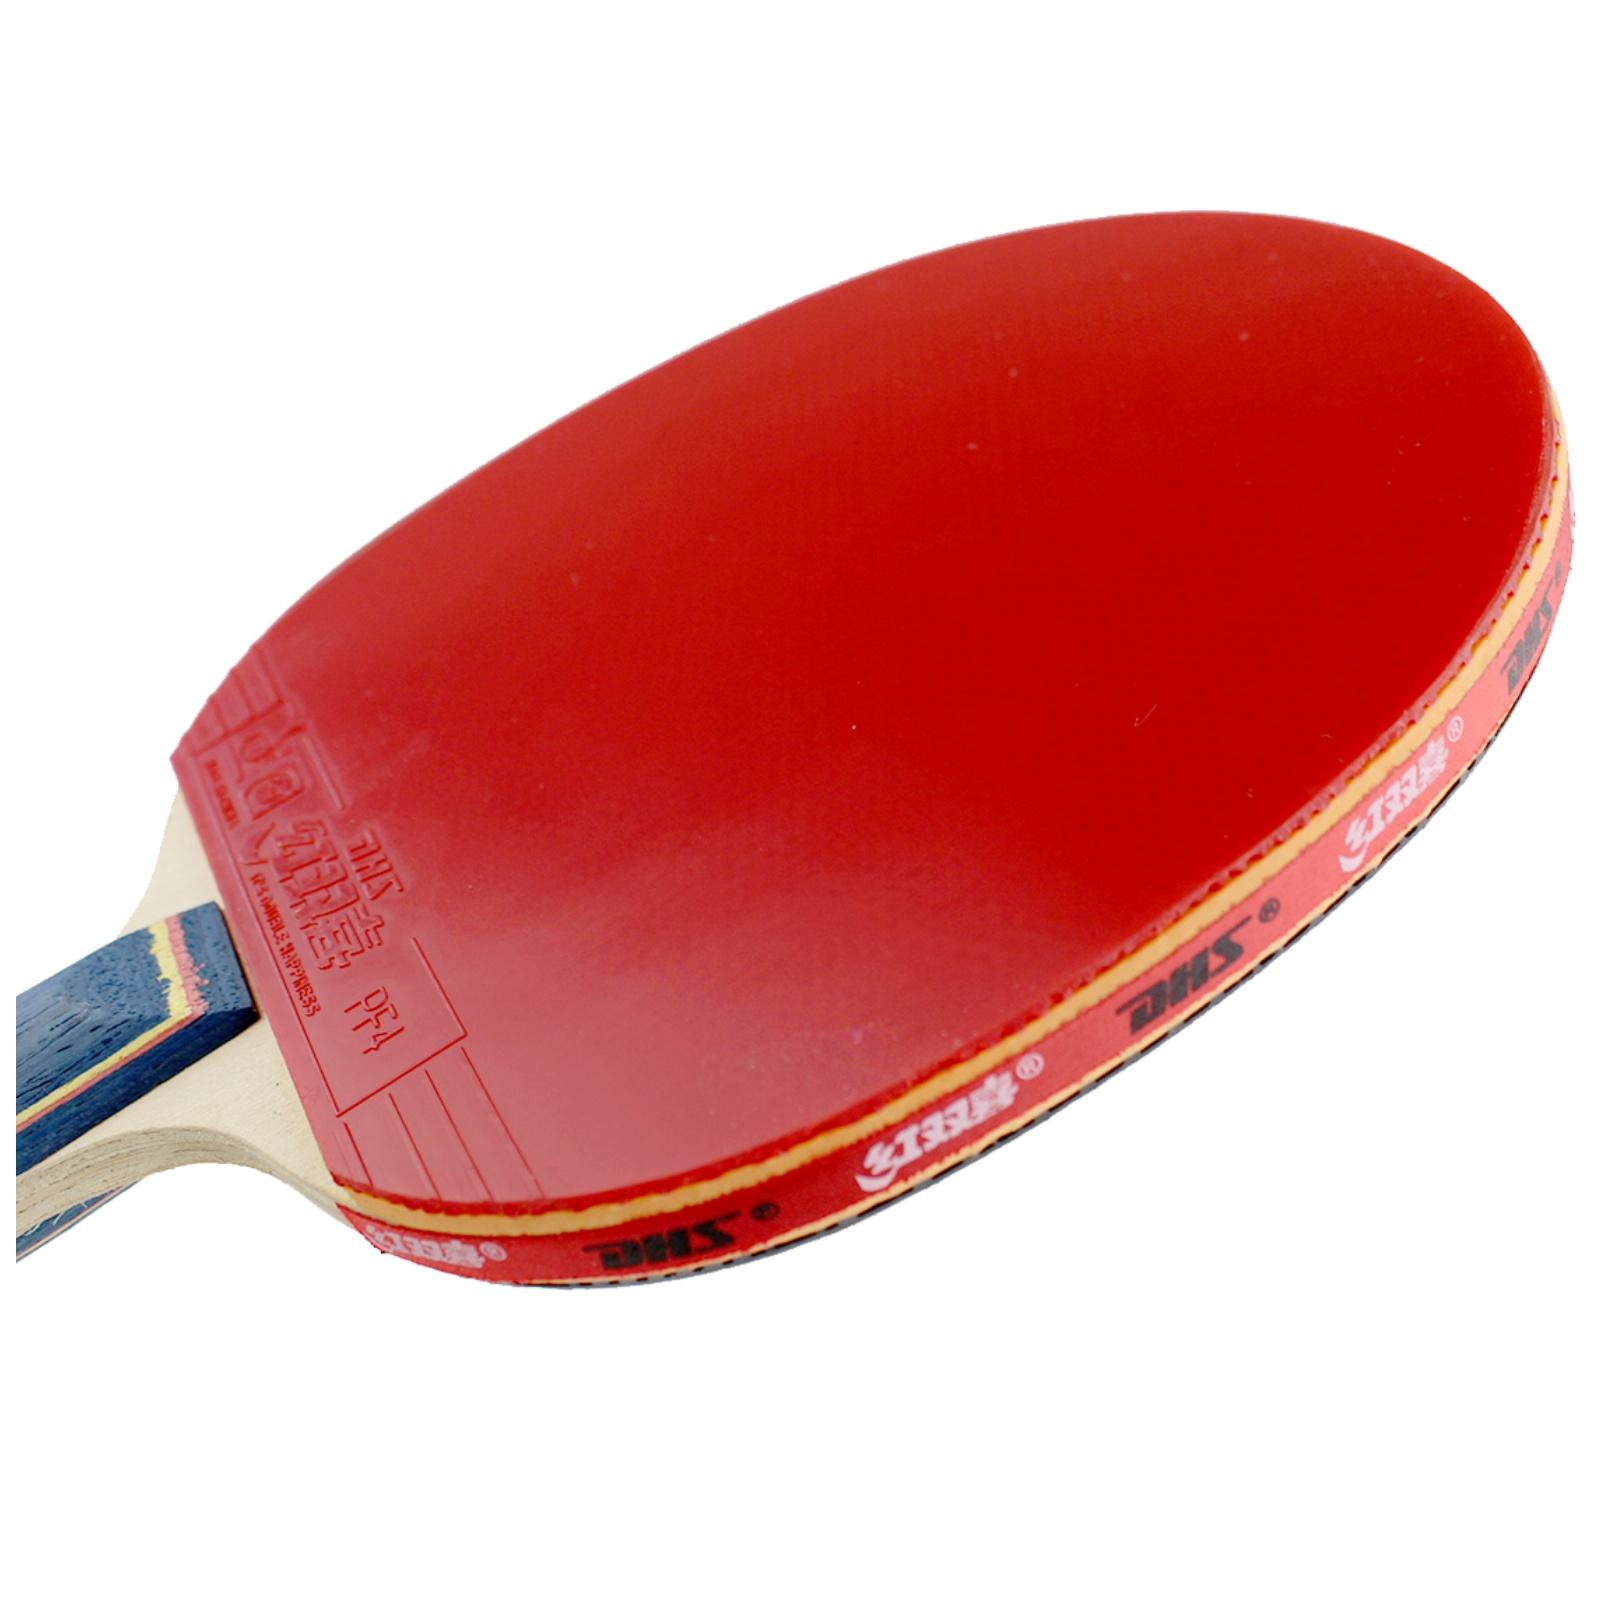 Pálka na stolní tenis DOUBLE HAPPINES 4402